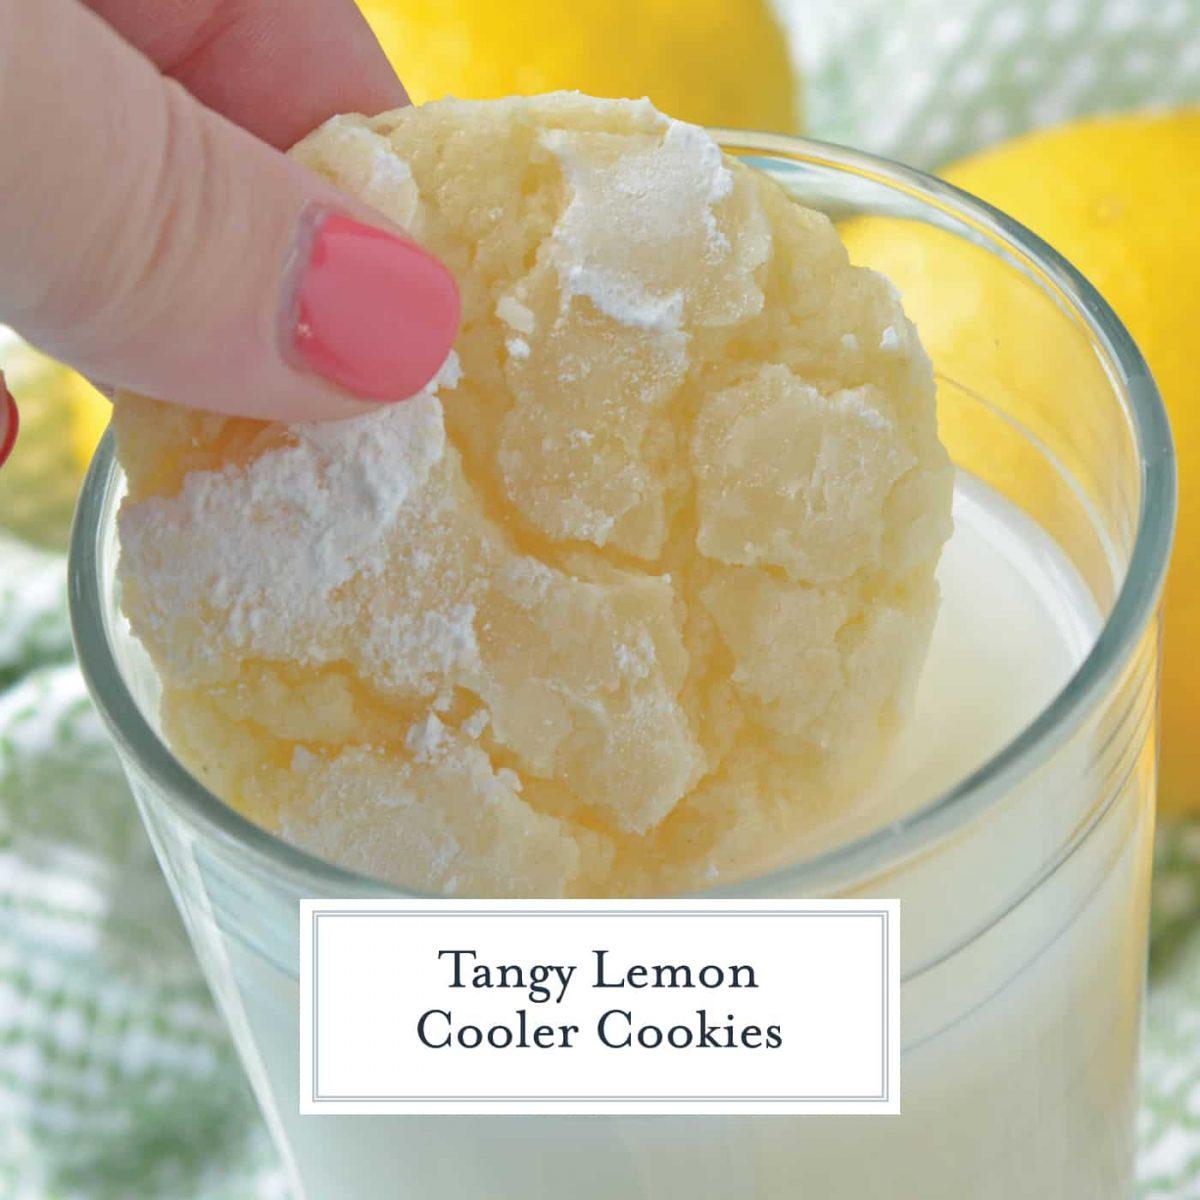 Lemon Cooler Cookies, also known as Sunshine Lemon Coolers, are a classic cookie recipe using fresh lemon and powdered sugar.#lemoncoolercookies #lemoncoolers #lemoncookies www.savoryexperiments.com